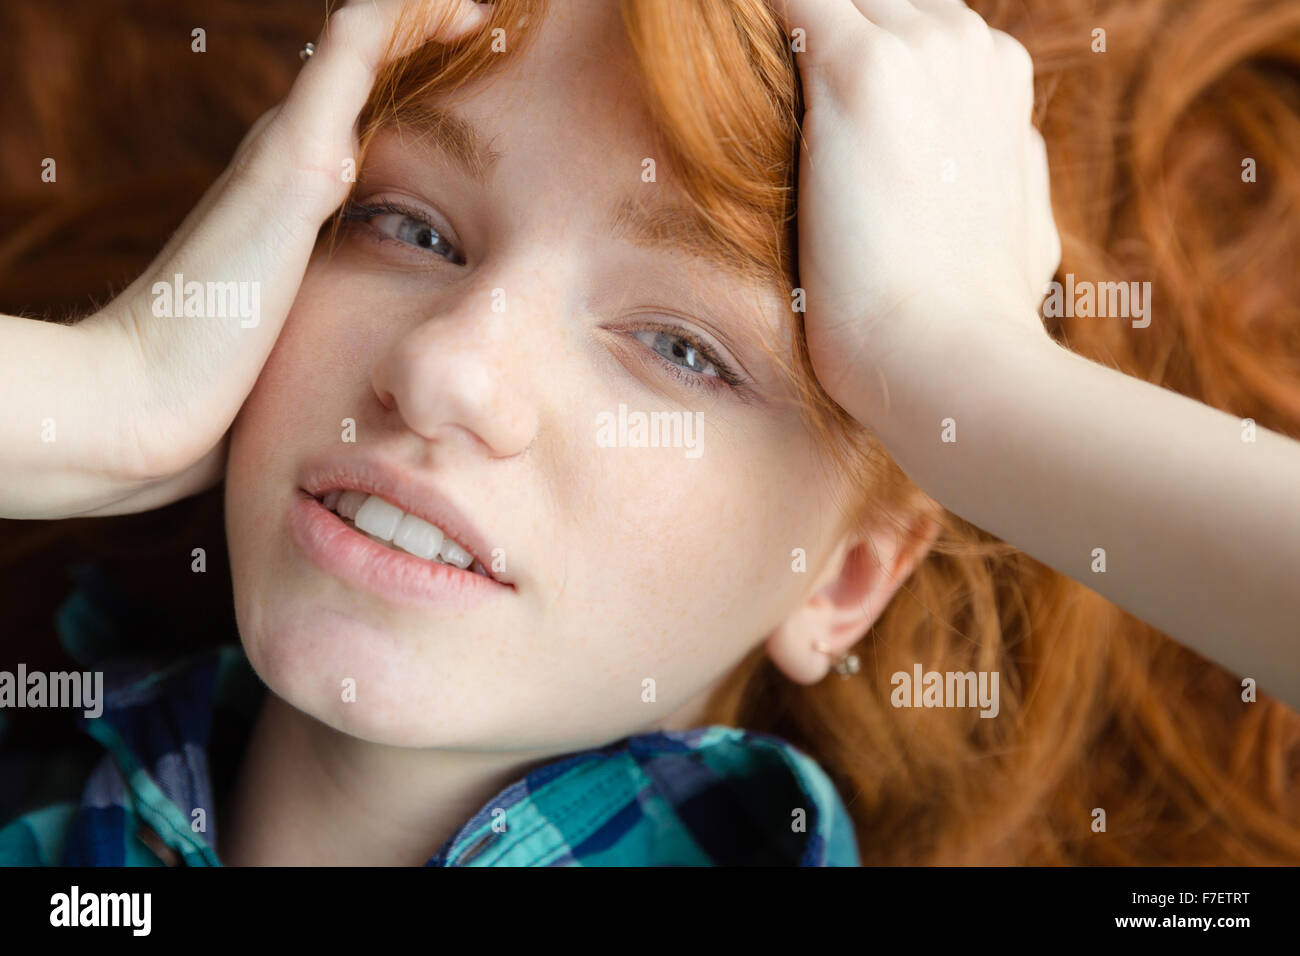 Redhead girl on girl